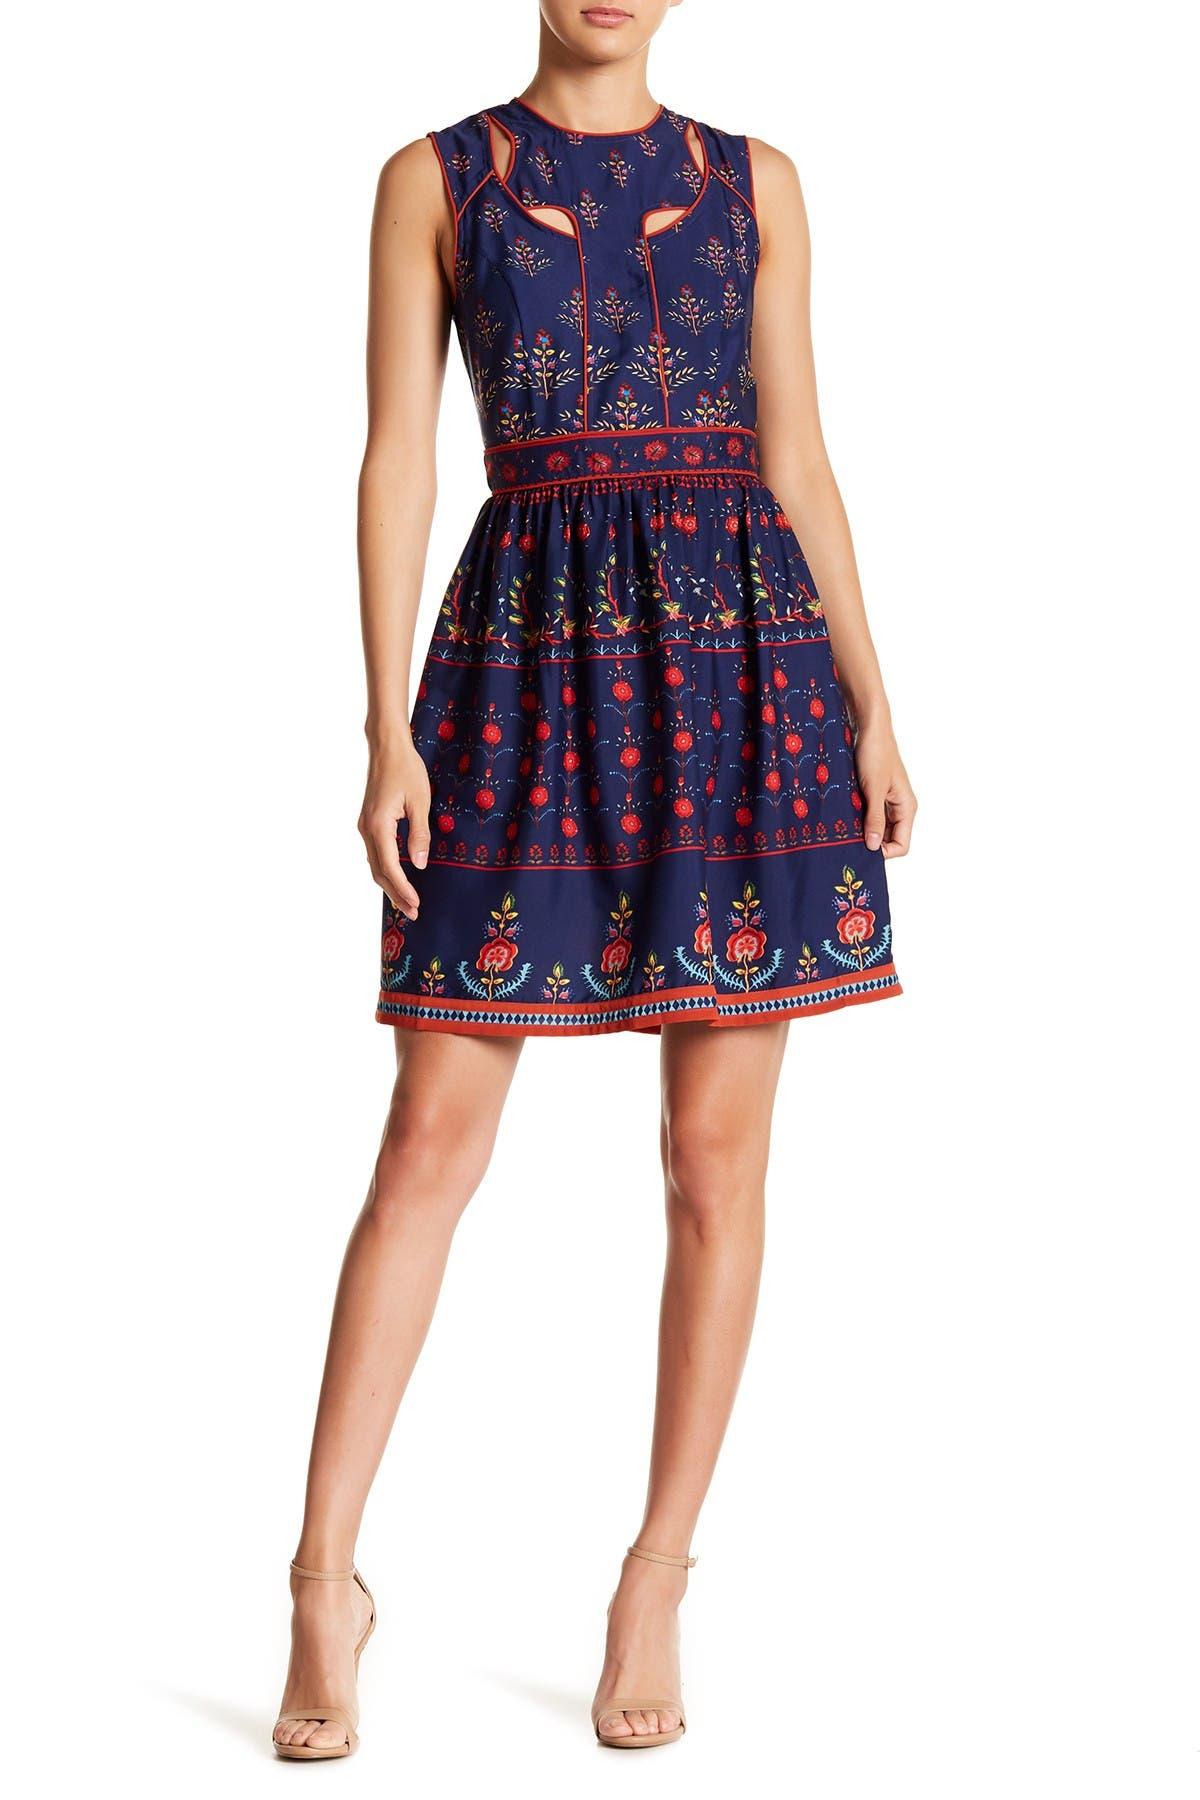 Image of Alexia Admor Jewel Neck Cutout Dress